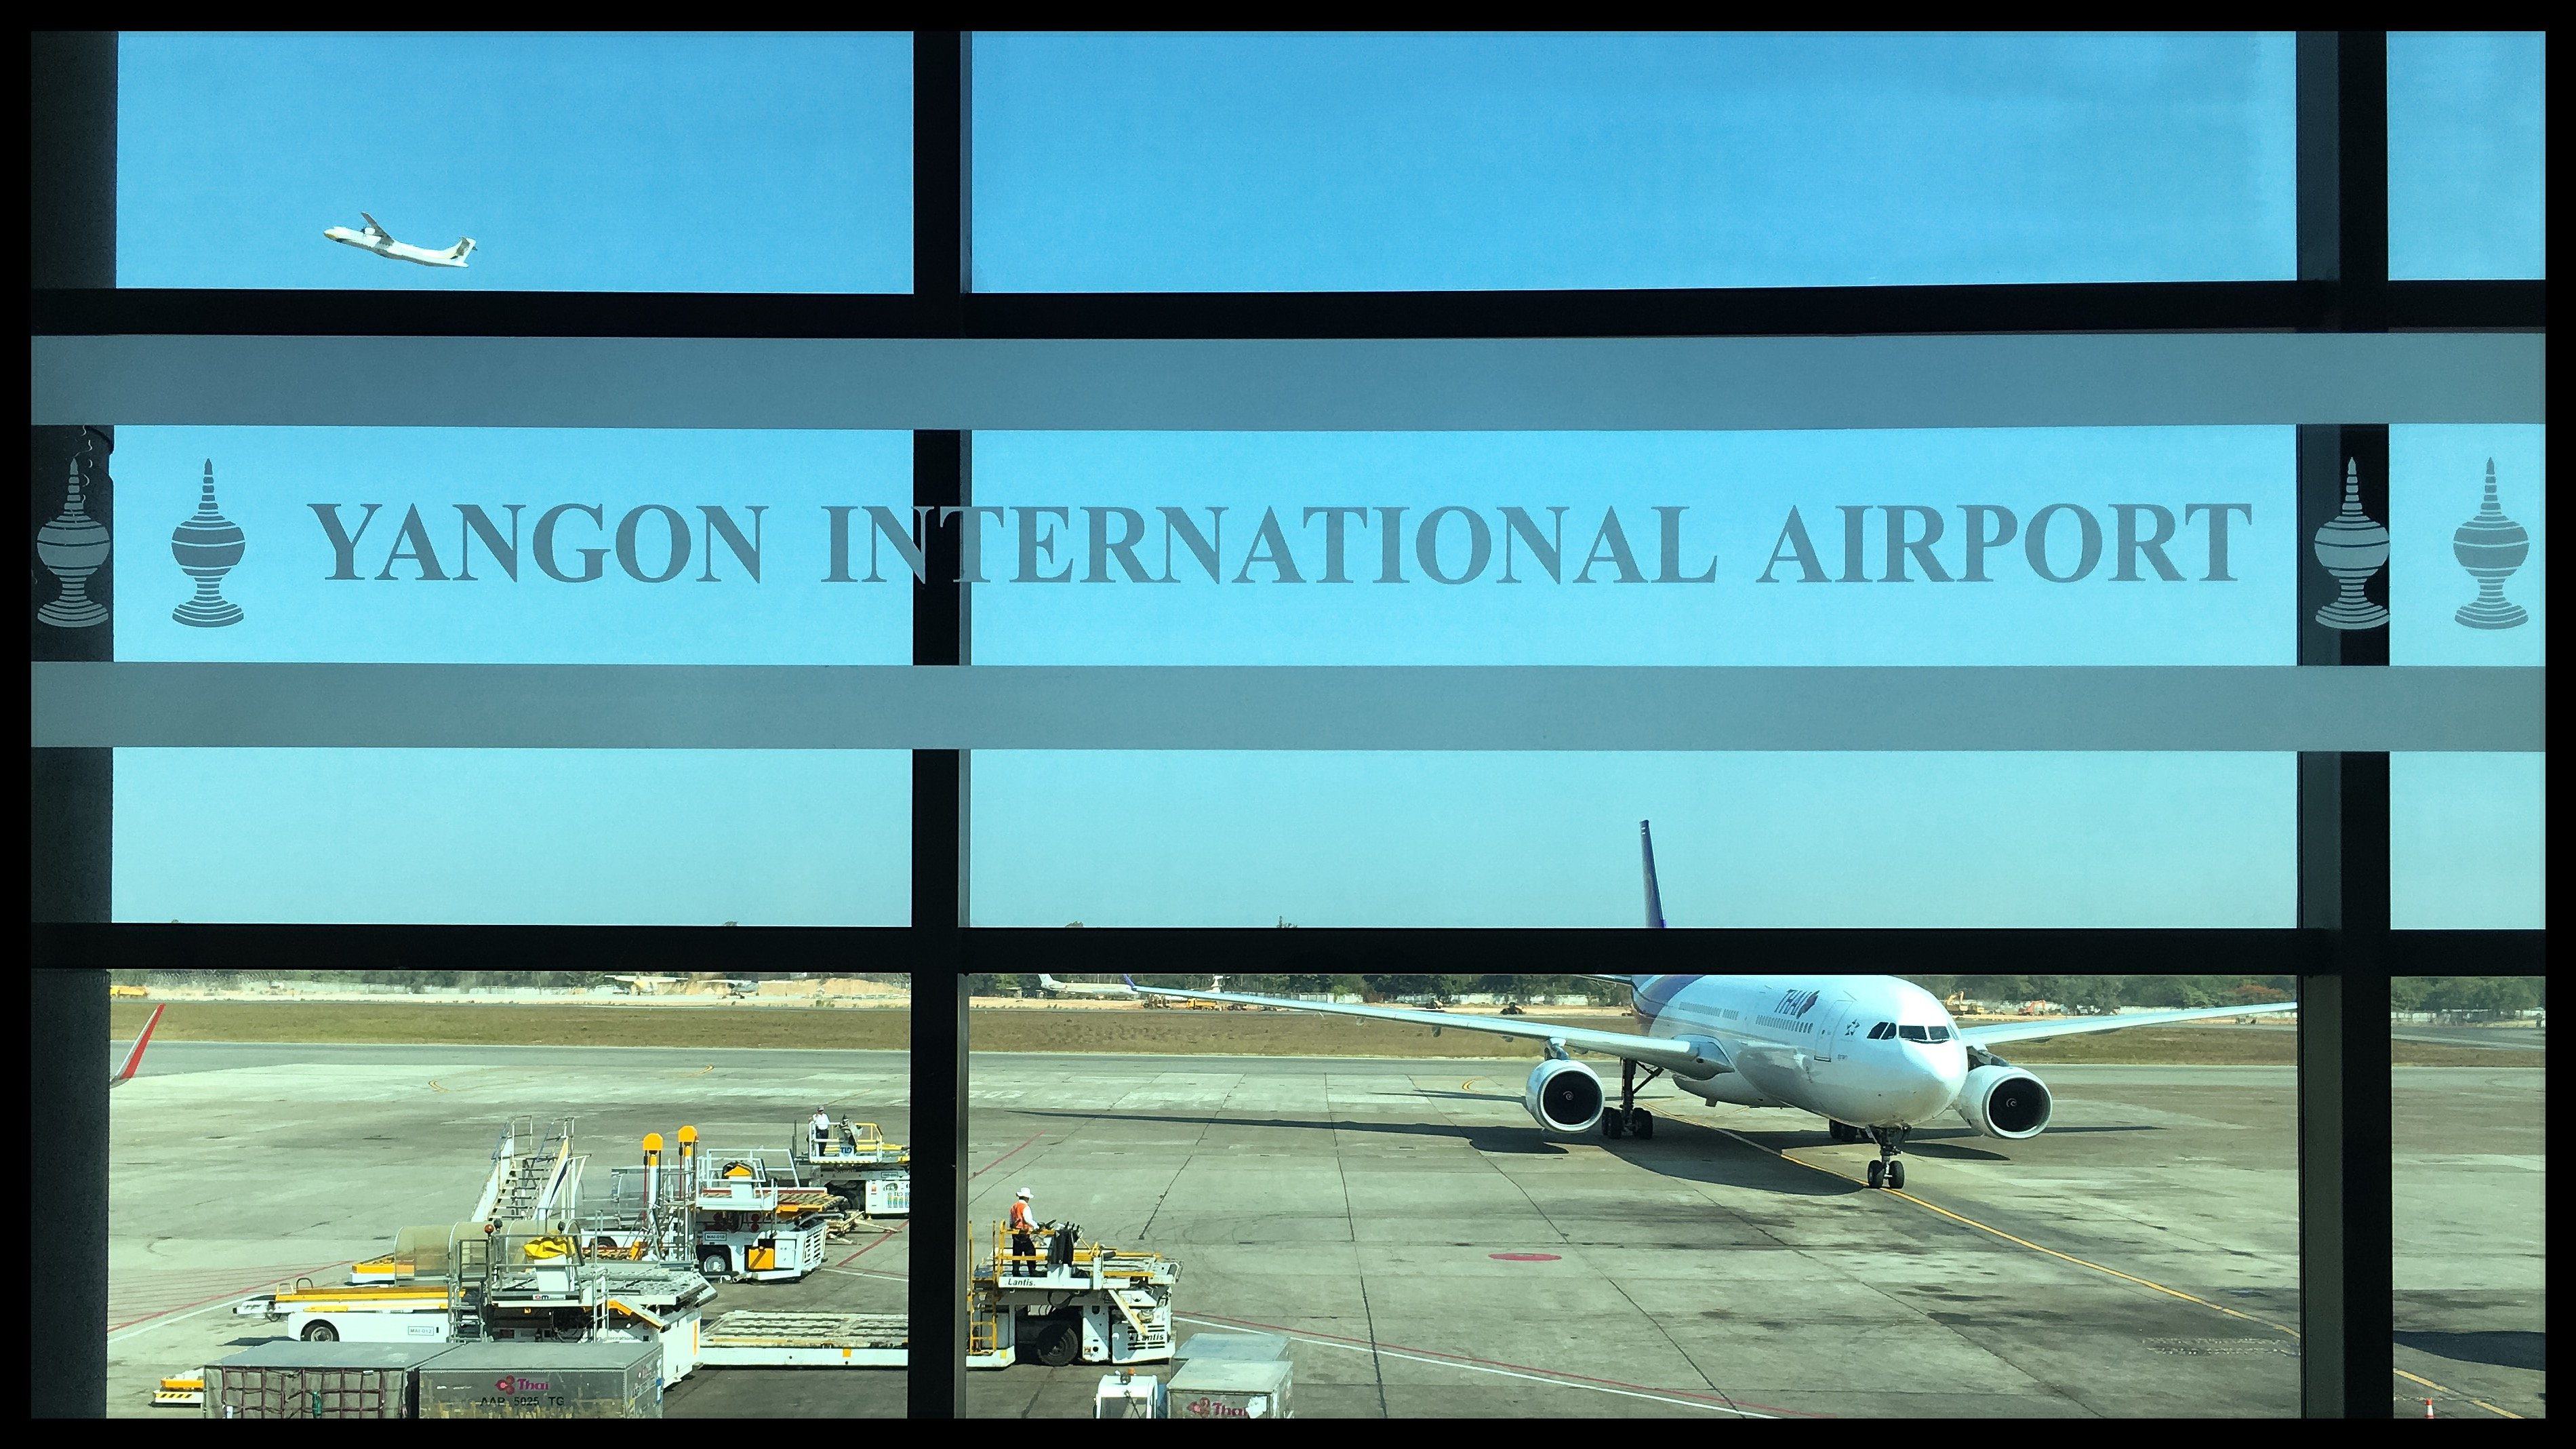 Arrivo all'aeroporto di Yangon, Myanmar